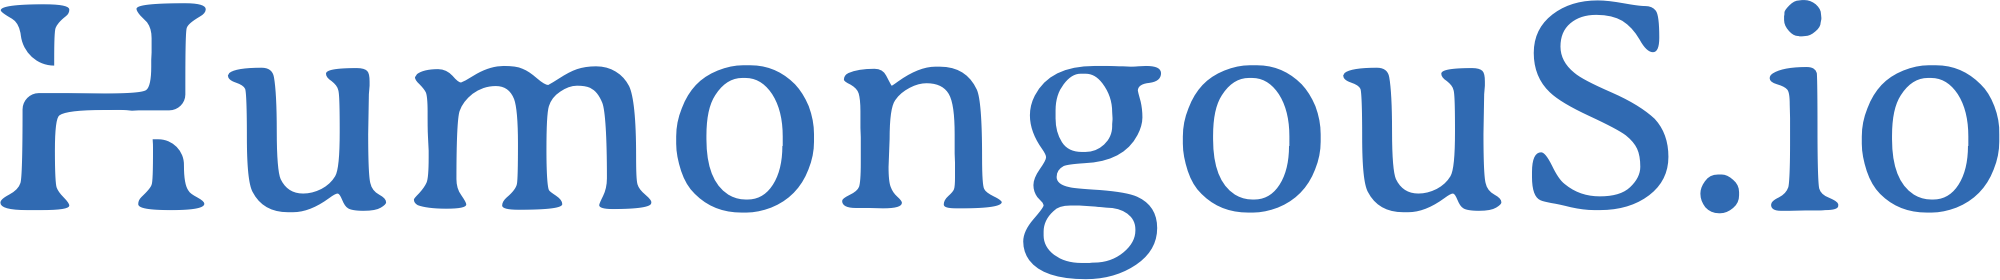 HumongouS.io Blog logo